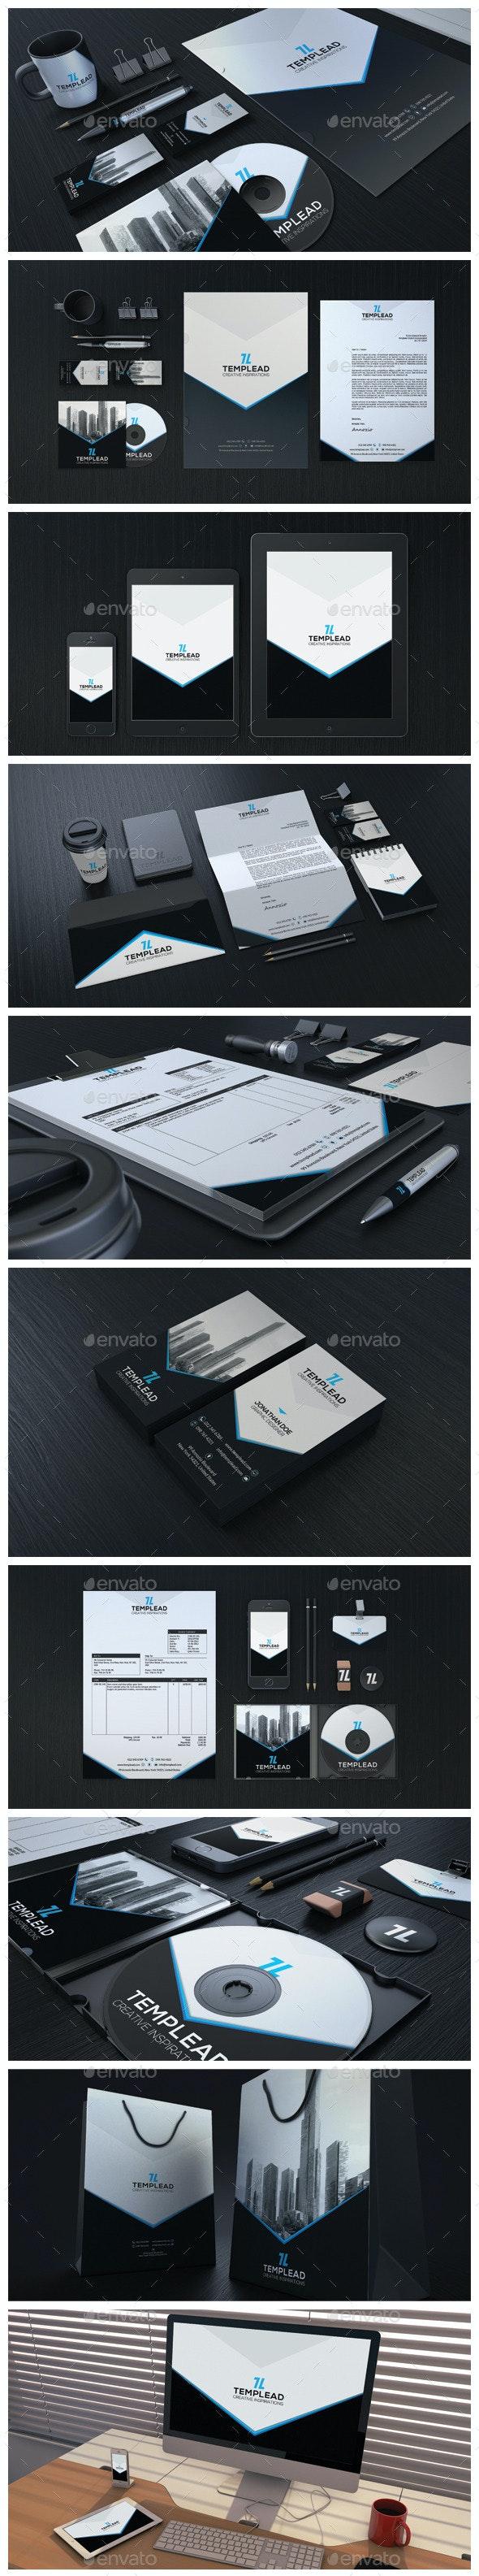 Modern Corporate Identity CI0007 - Stationery Print Templates